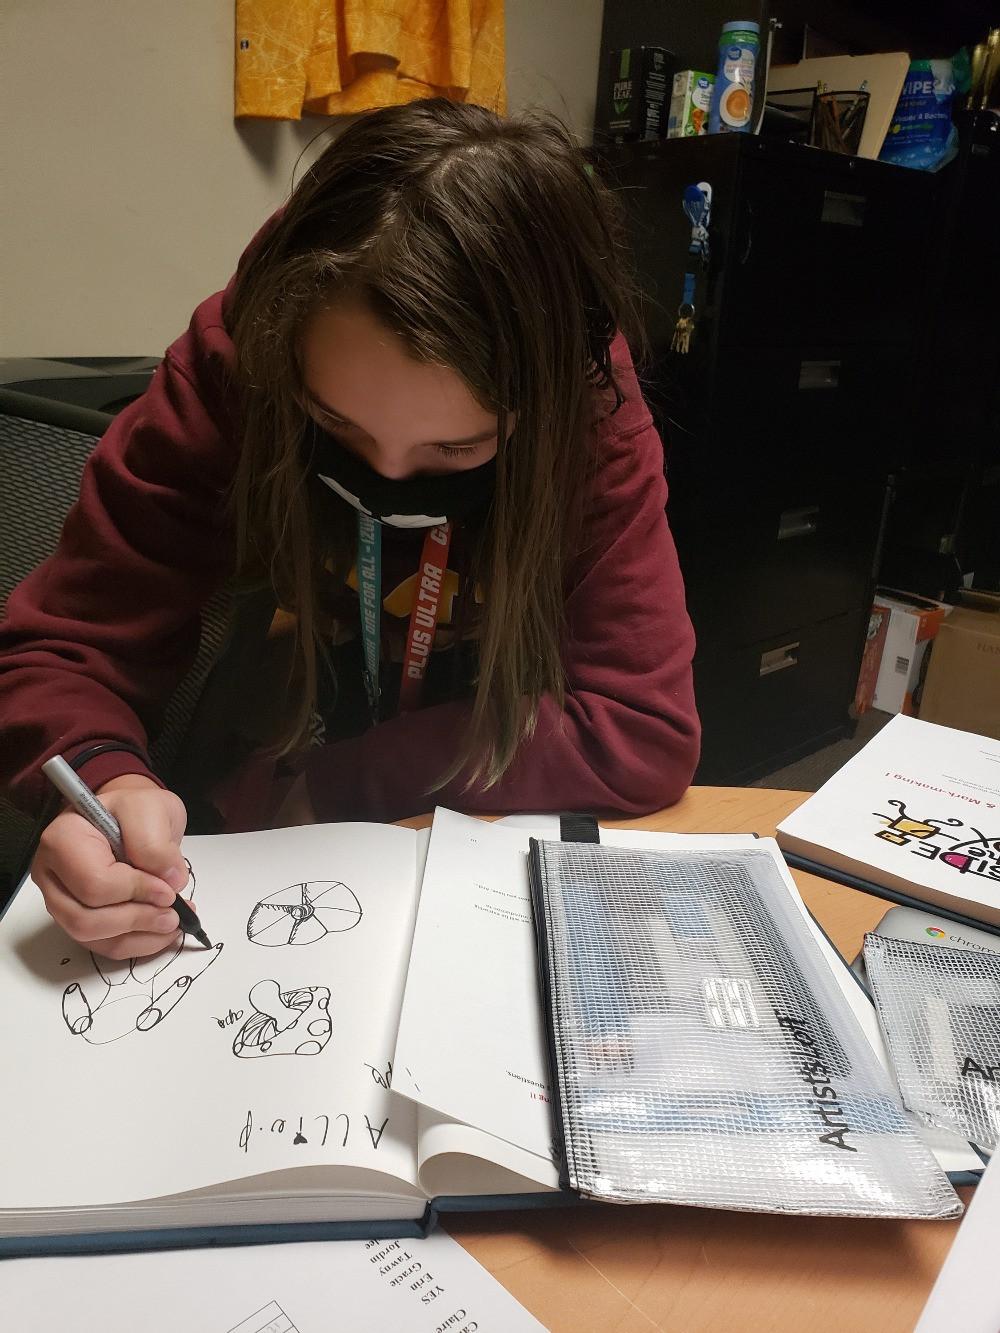 Girl draws in sketchbook